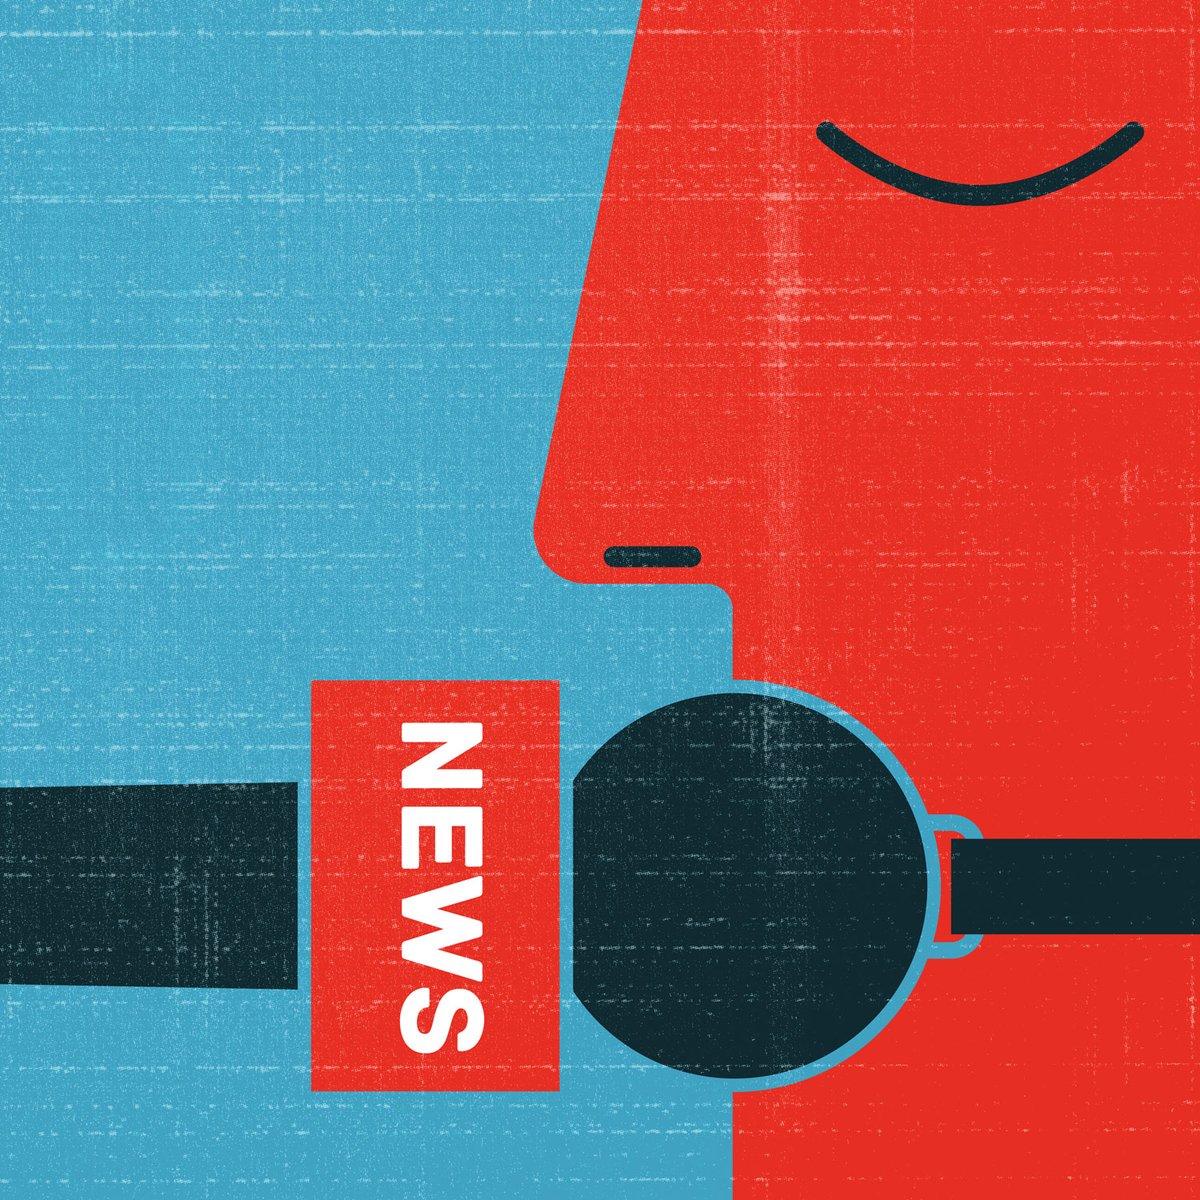 My new illustration. Fake news. #conceptual #illustration #editorial #FakeNews #illustrator #freelancer